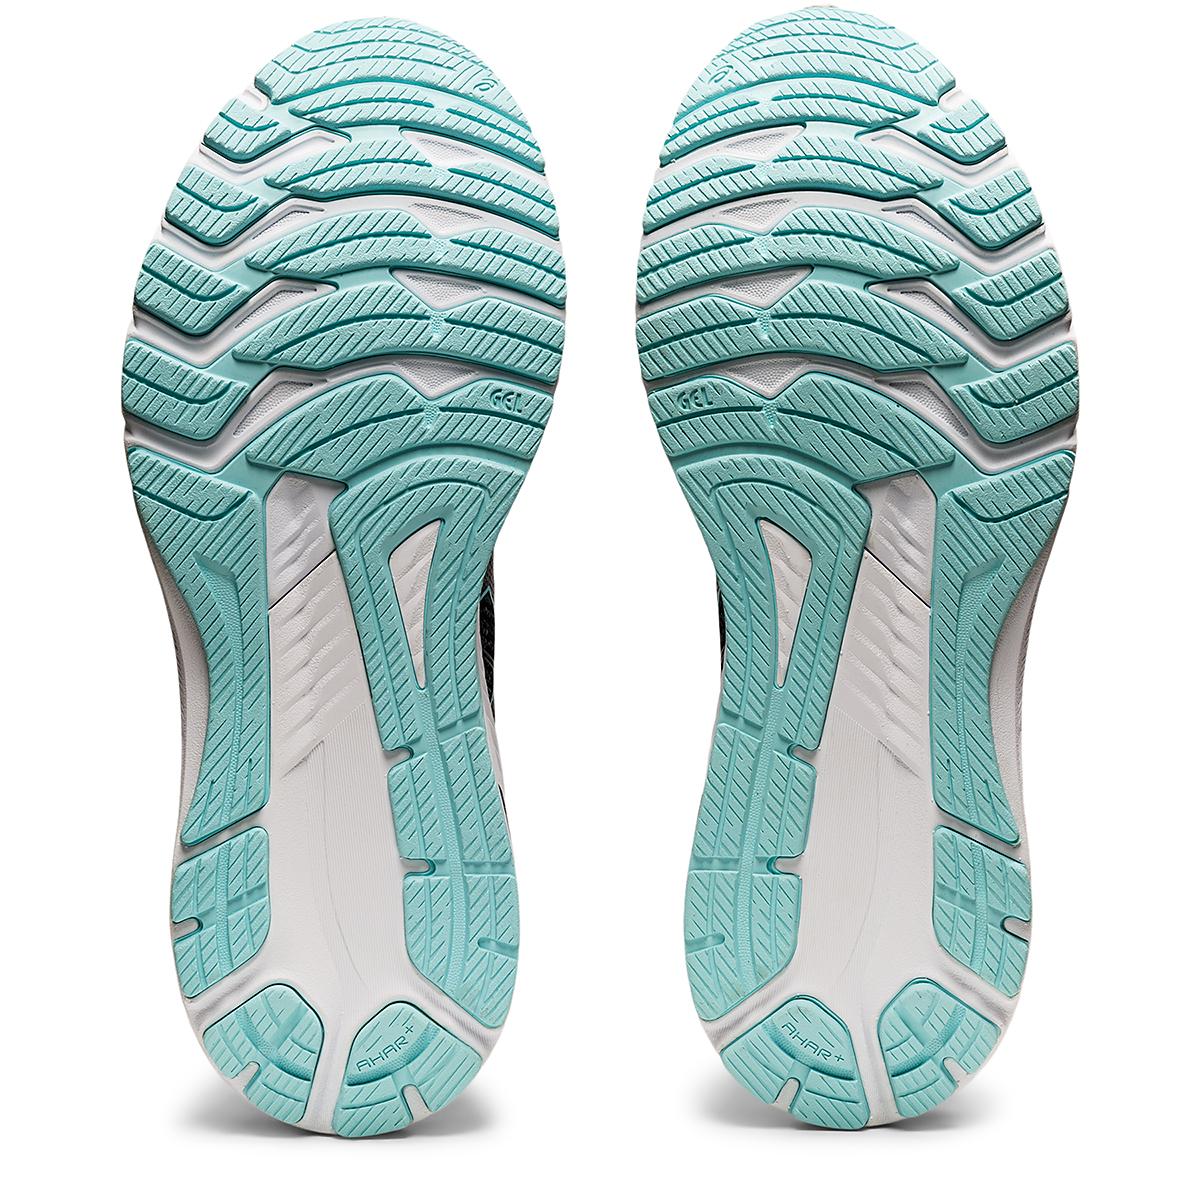 Men's Asics GT-2000 10 Running Shoe - Color: Metropolis/Electric Red - Size: 7 - Width: Regular, Metropolis/Electric Red, large, image 7